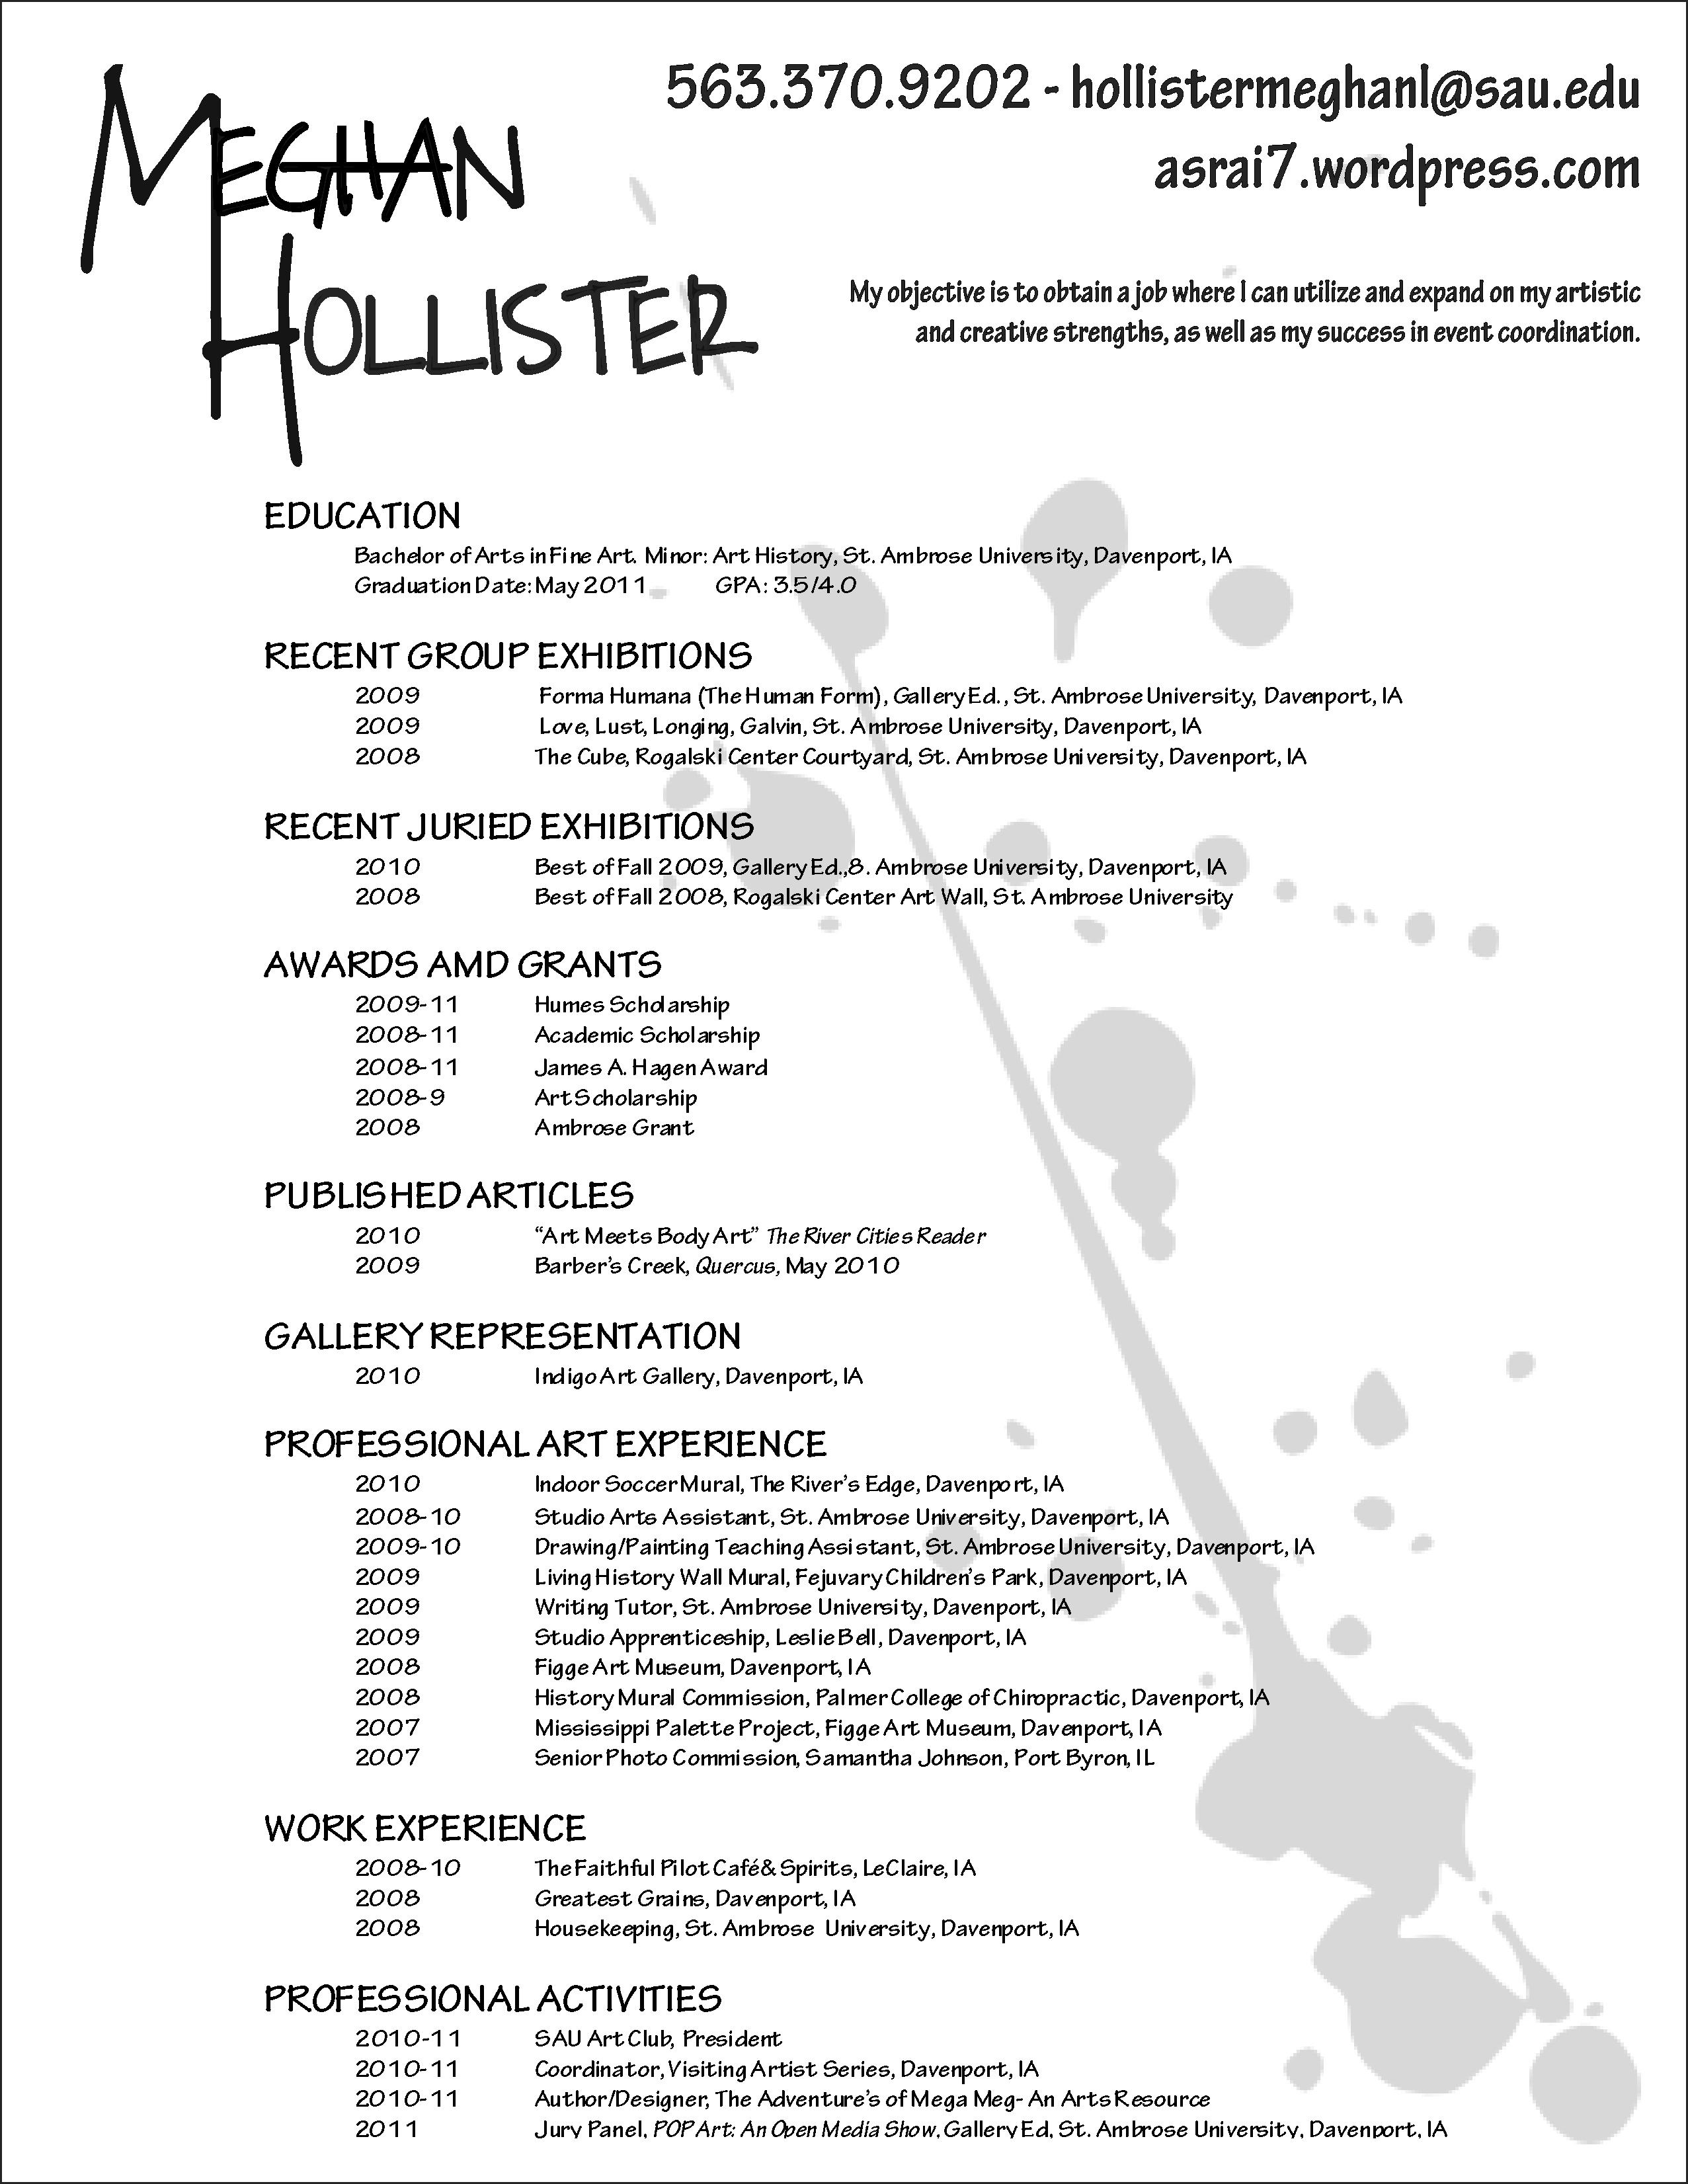 Resume For Artist. makeup artist resumes. resume resources resume ...